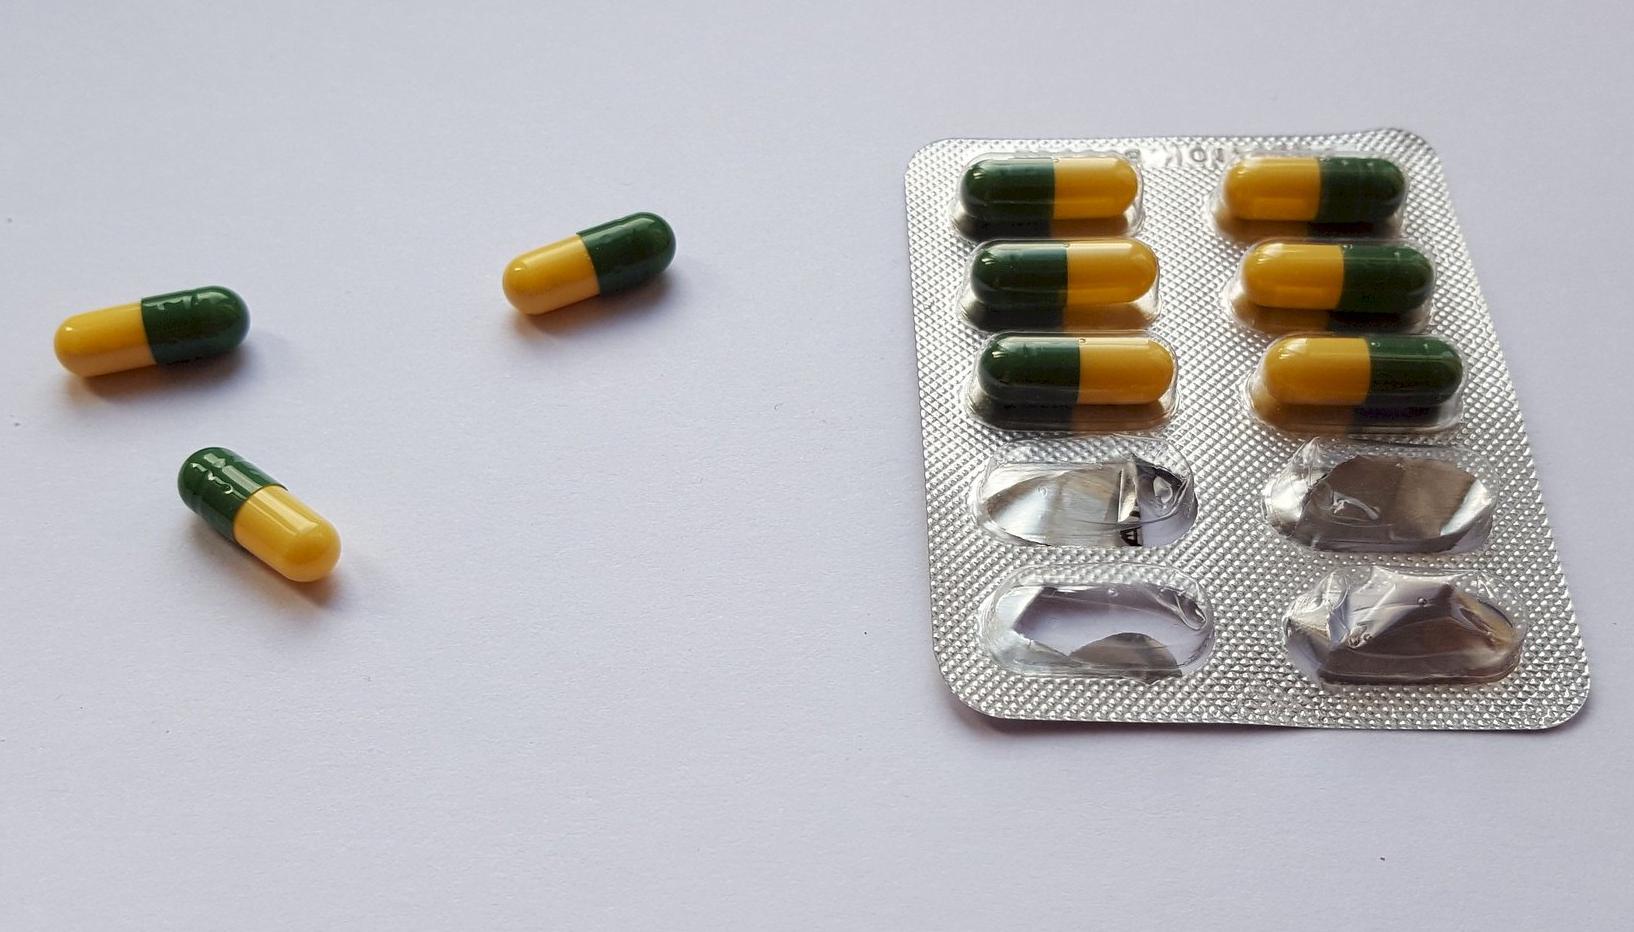 Одновременный приём трамадола снекоторыми антидепрессантами оказался противопоказан.